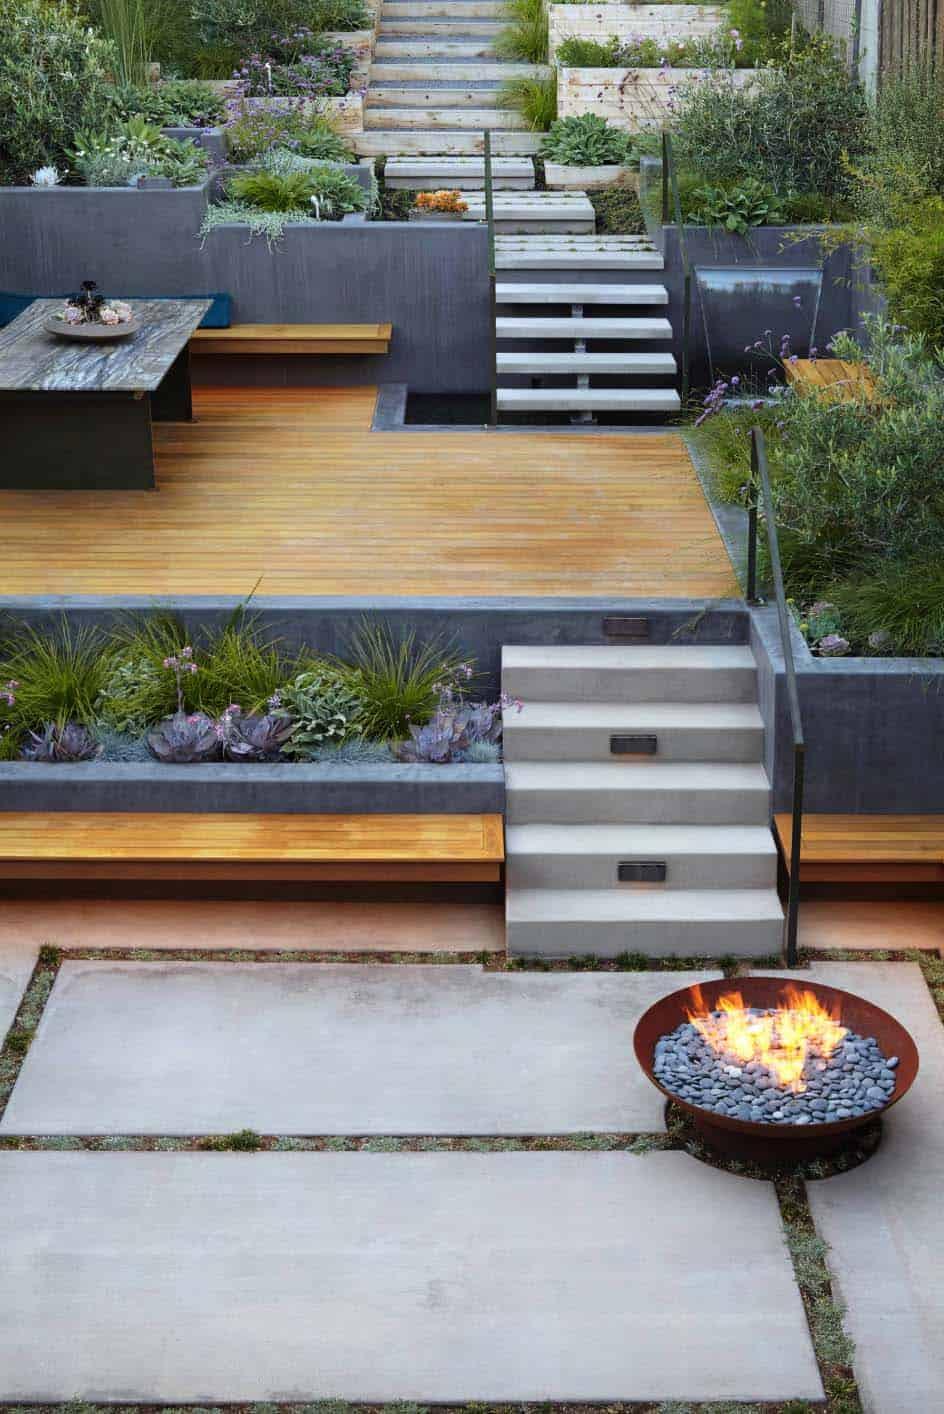 28 Inspiring Fire Pit Ideas To Create A Fabulous Backyard ... on Fire Pit Design  id=95364